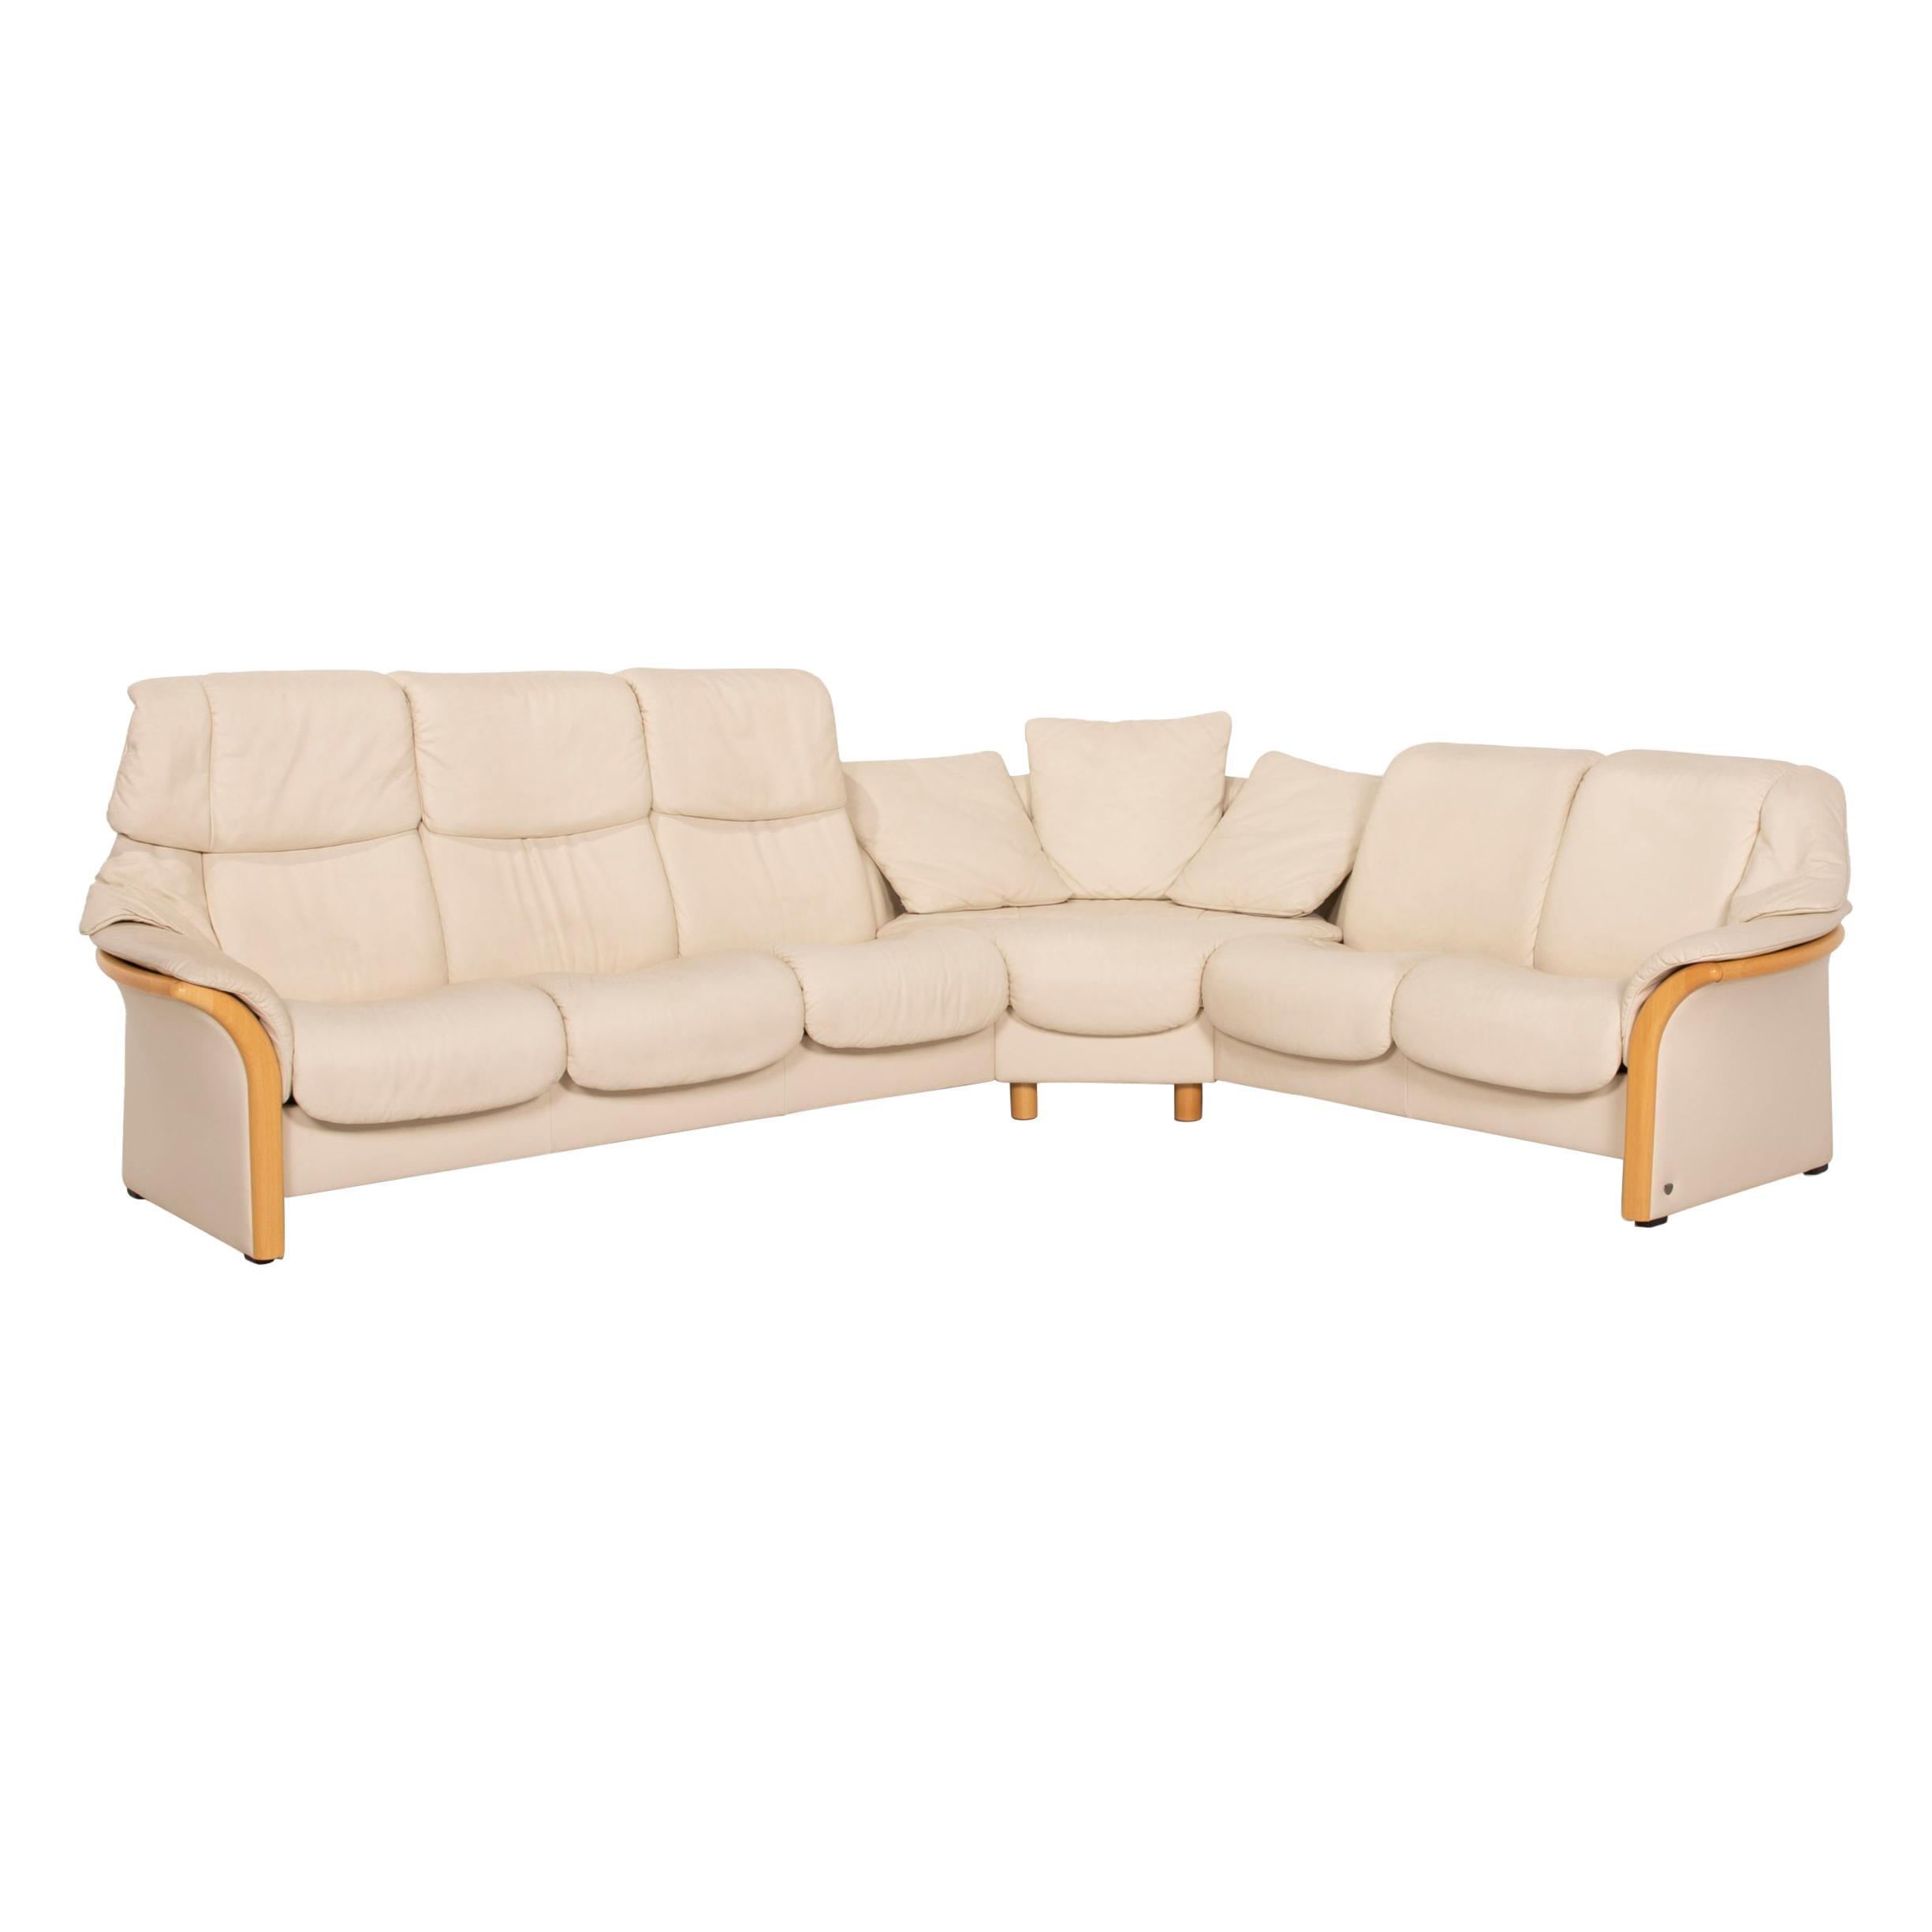 Stressless Eldorado Leather Cream Corner Sofa